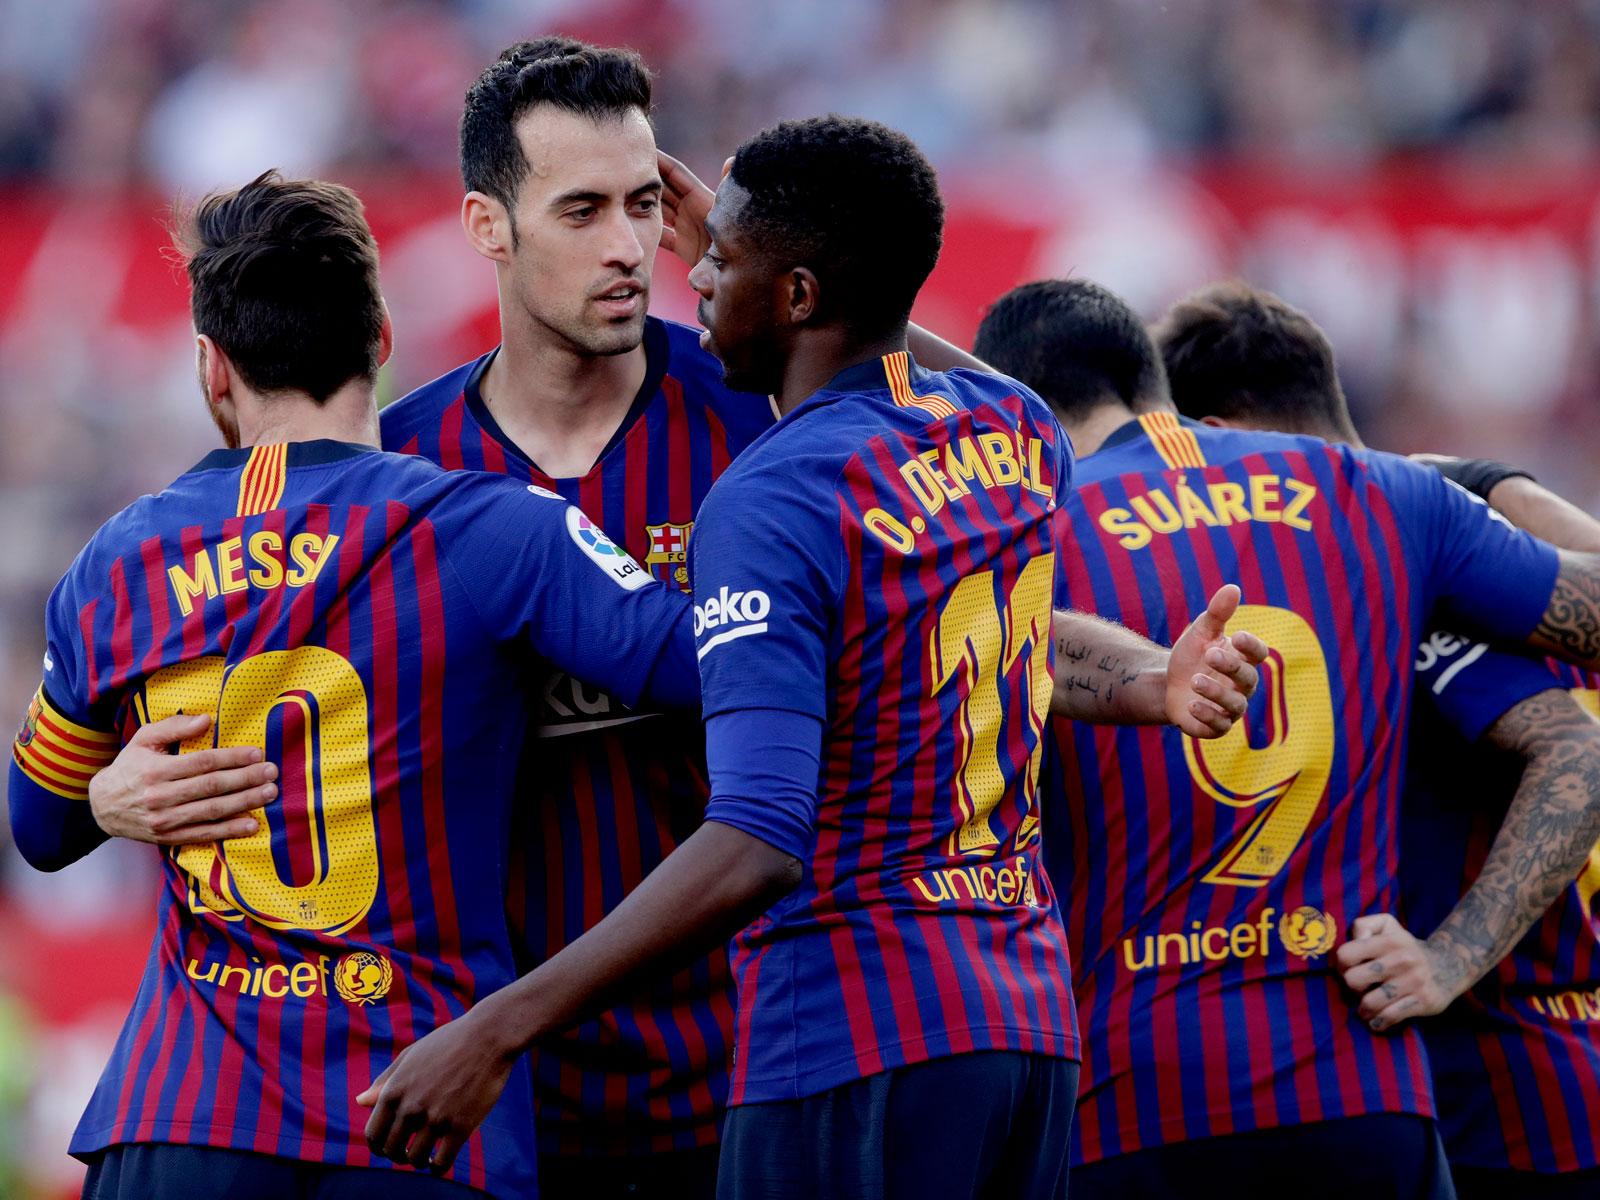 Sergio Busquets has been a centerpiece of Barcelona's midfield